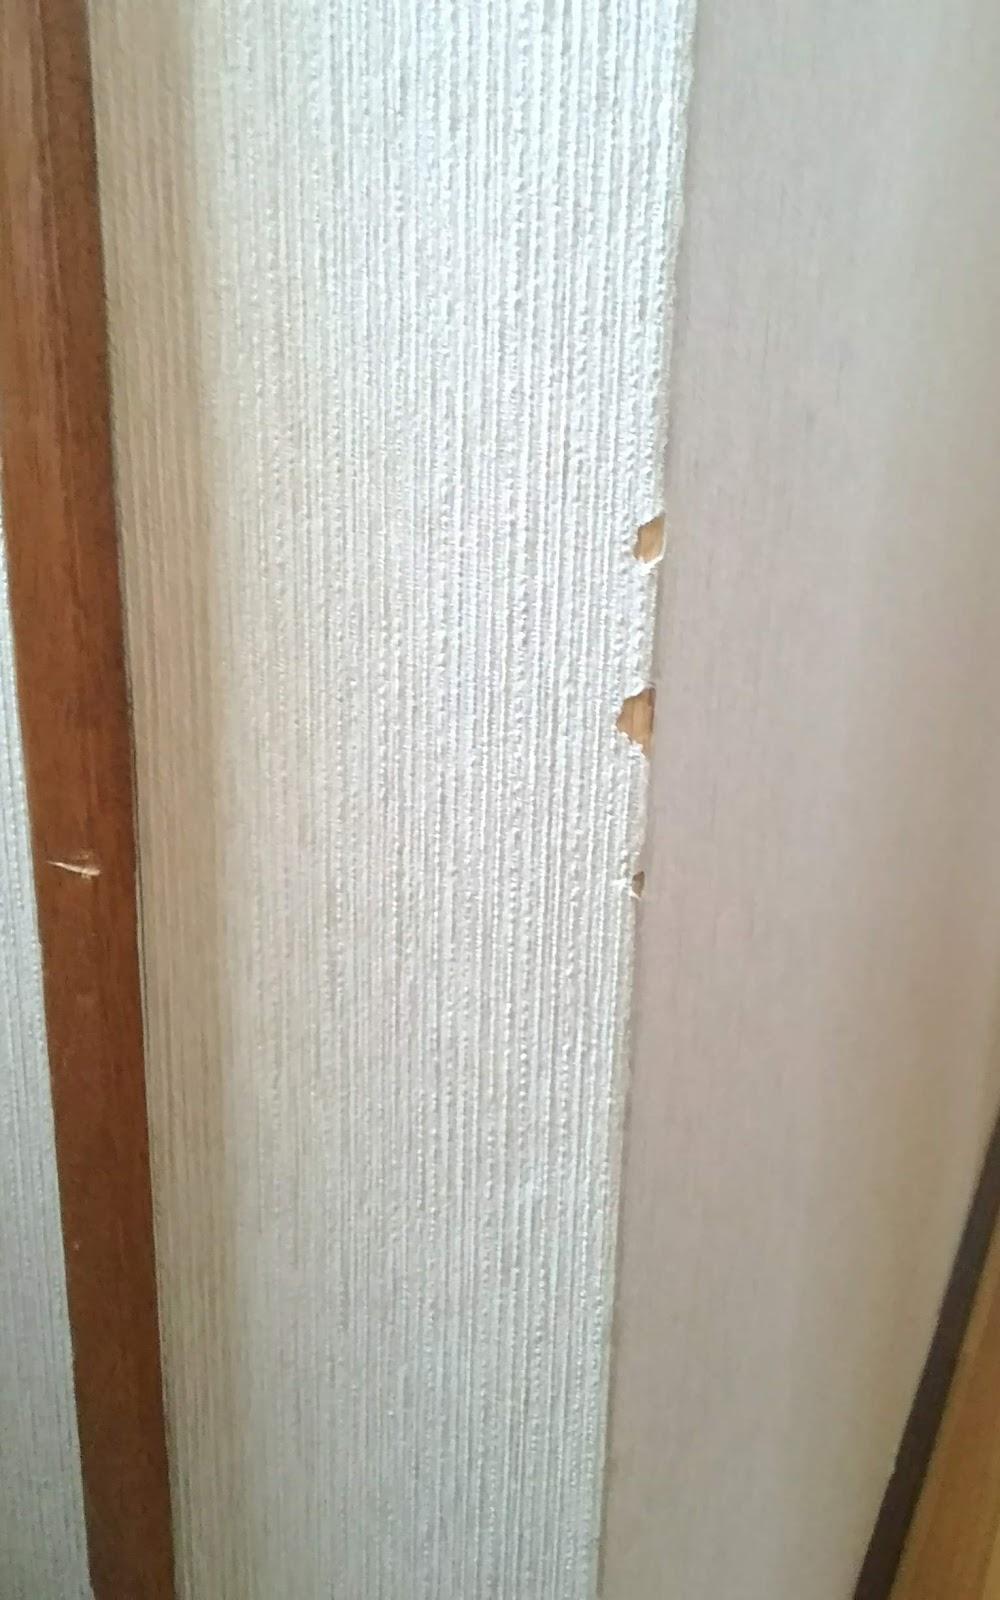 Diy 壁紙の角部の破れの補修ーl字アングルで手軽に補修